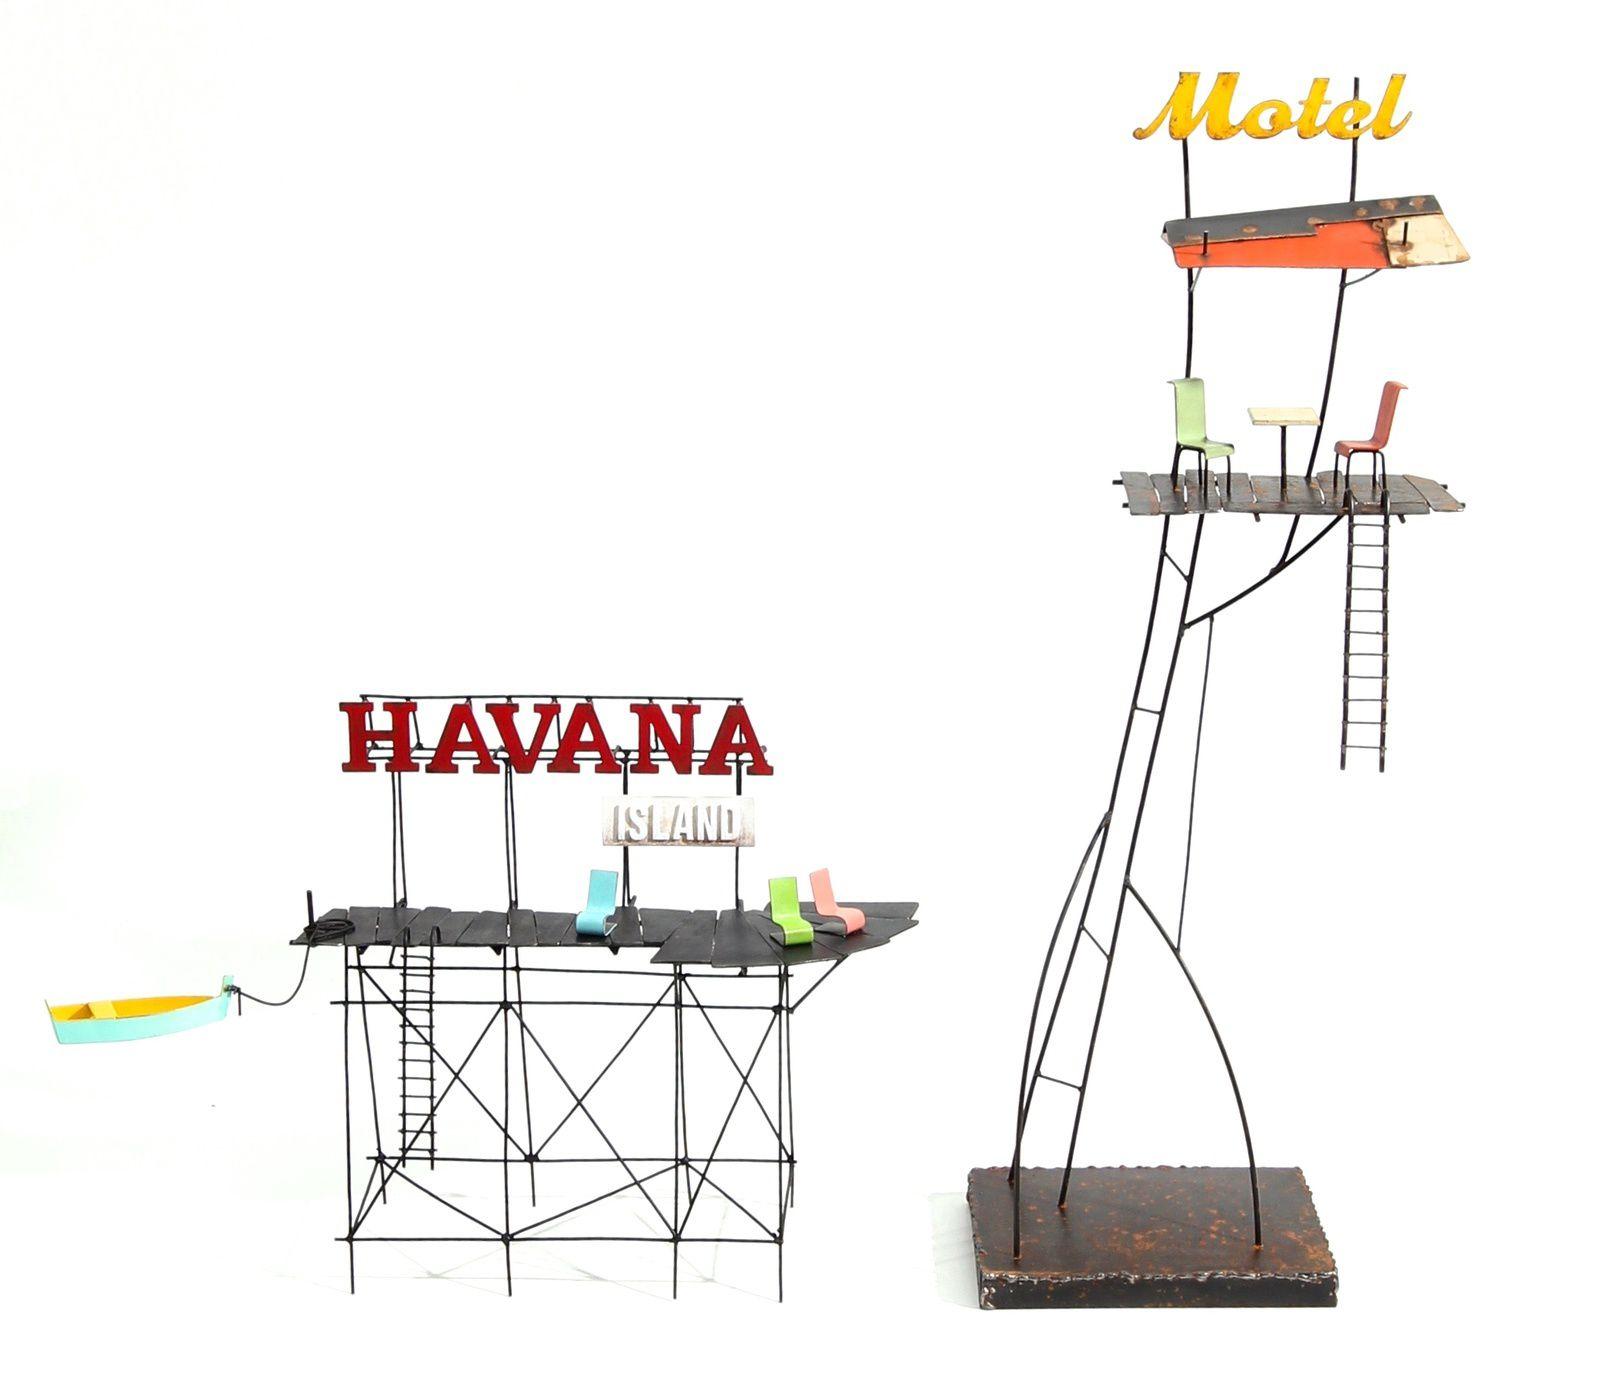 Summertime, h: 66 cm - Motel, h: 66 cm - Havana island, h: 32 cm - Paradise beach, h: 36 cm